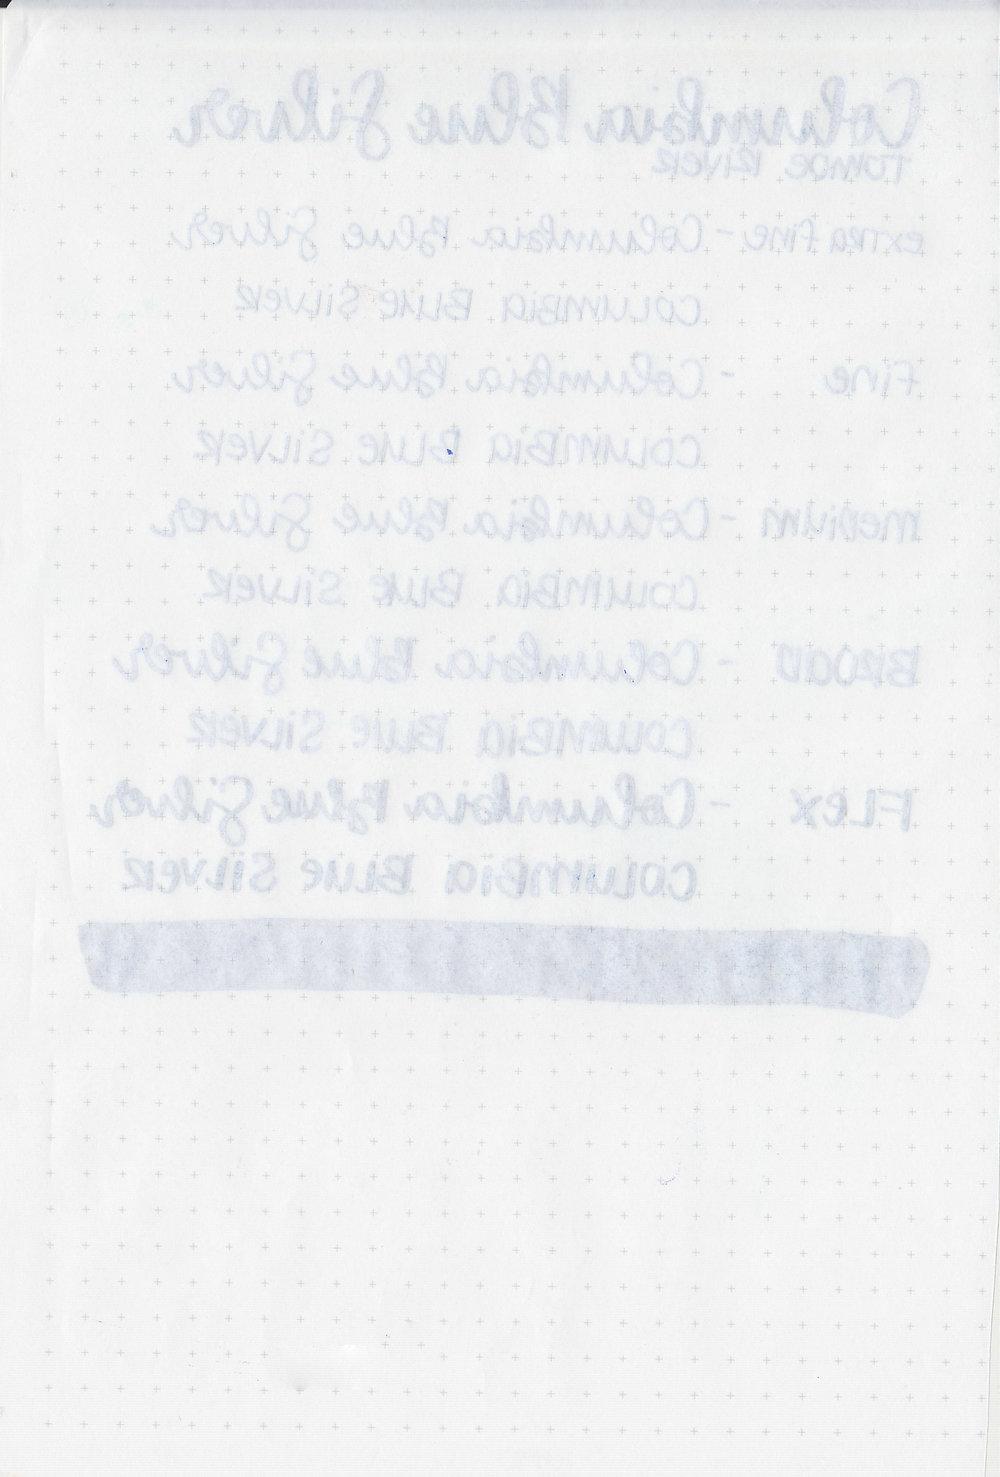 da-columbia-blue-11.jpg